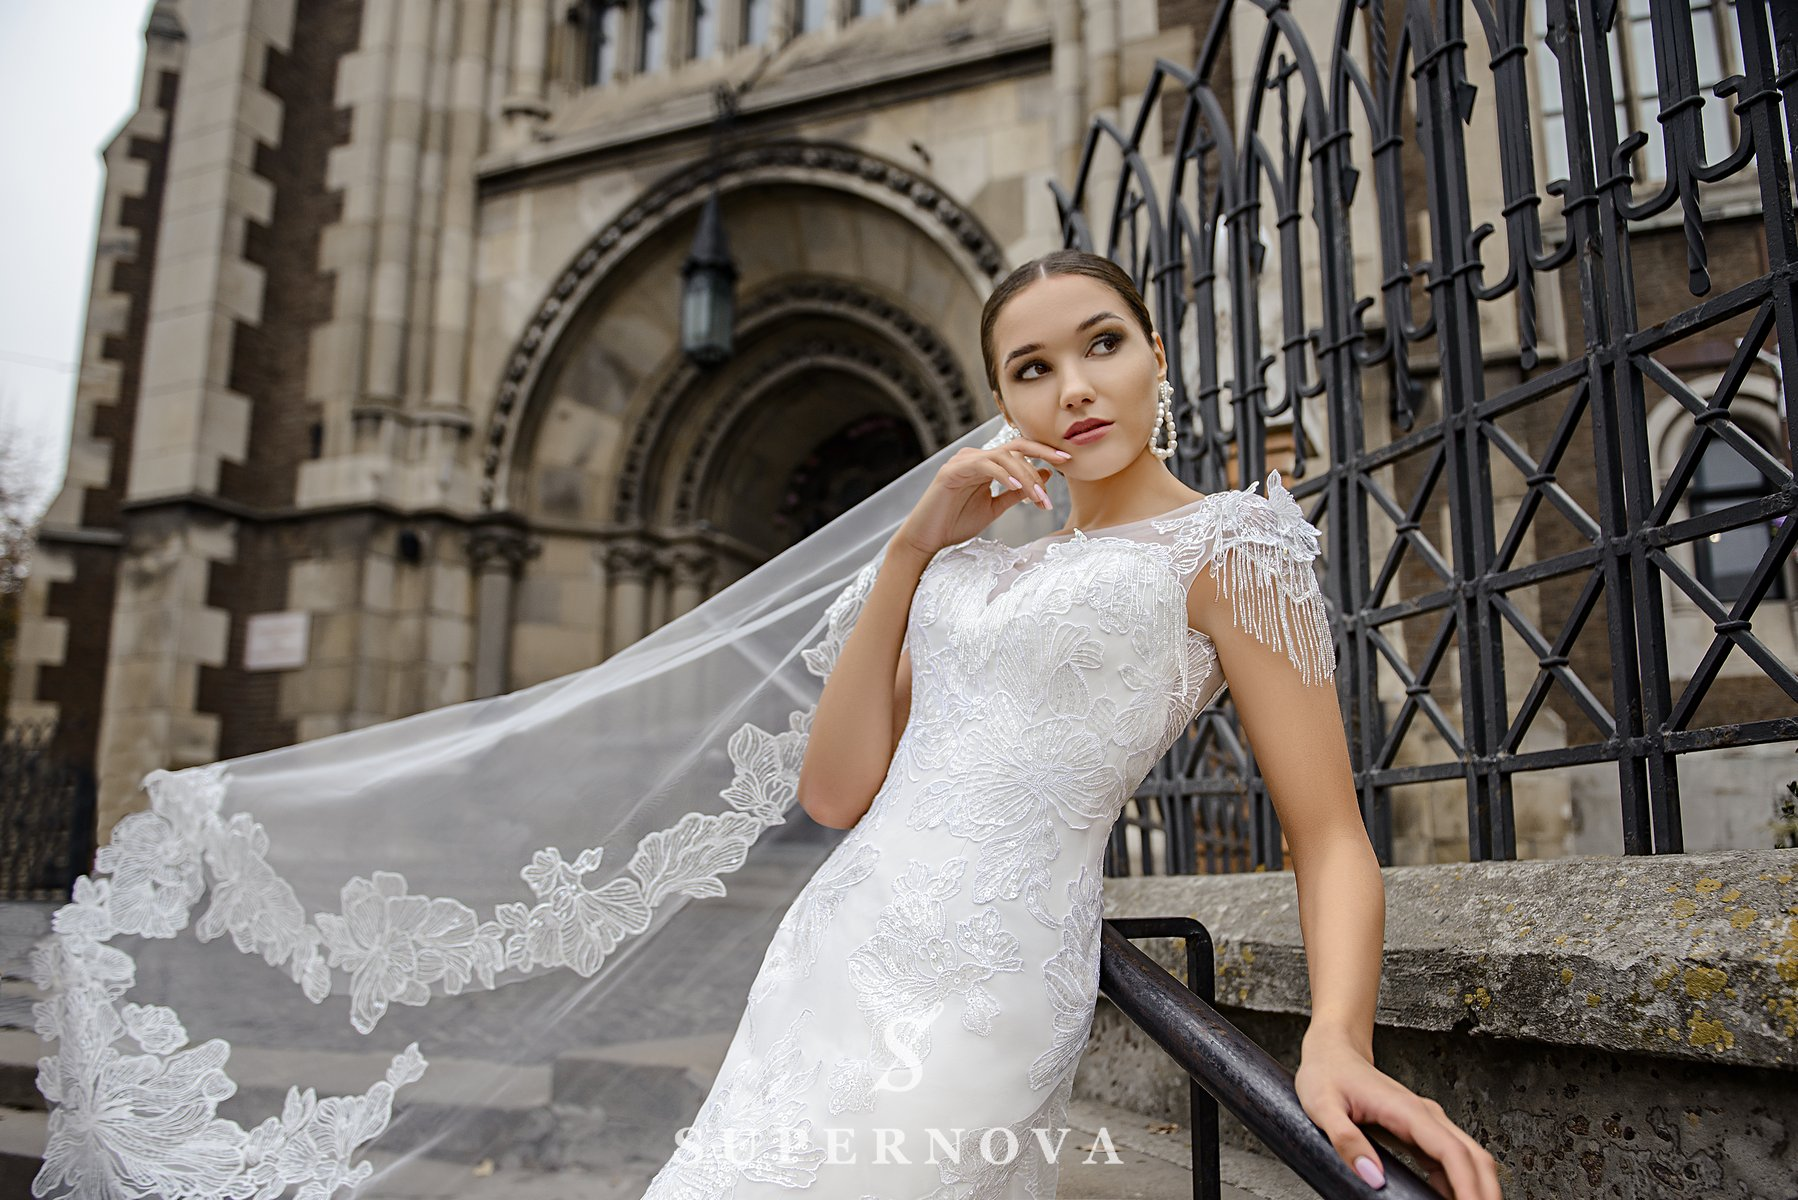 Wedding dress in godet style on a yoke on wholesale from SuperNova-1